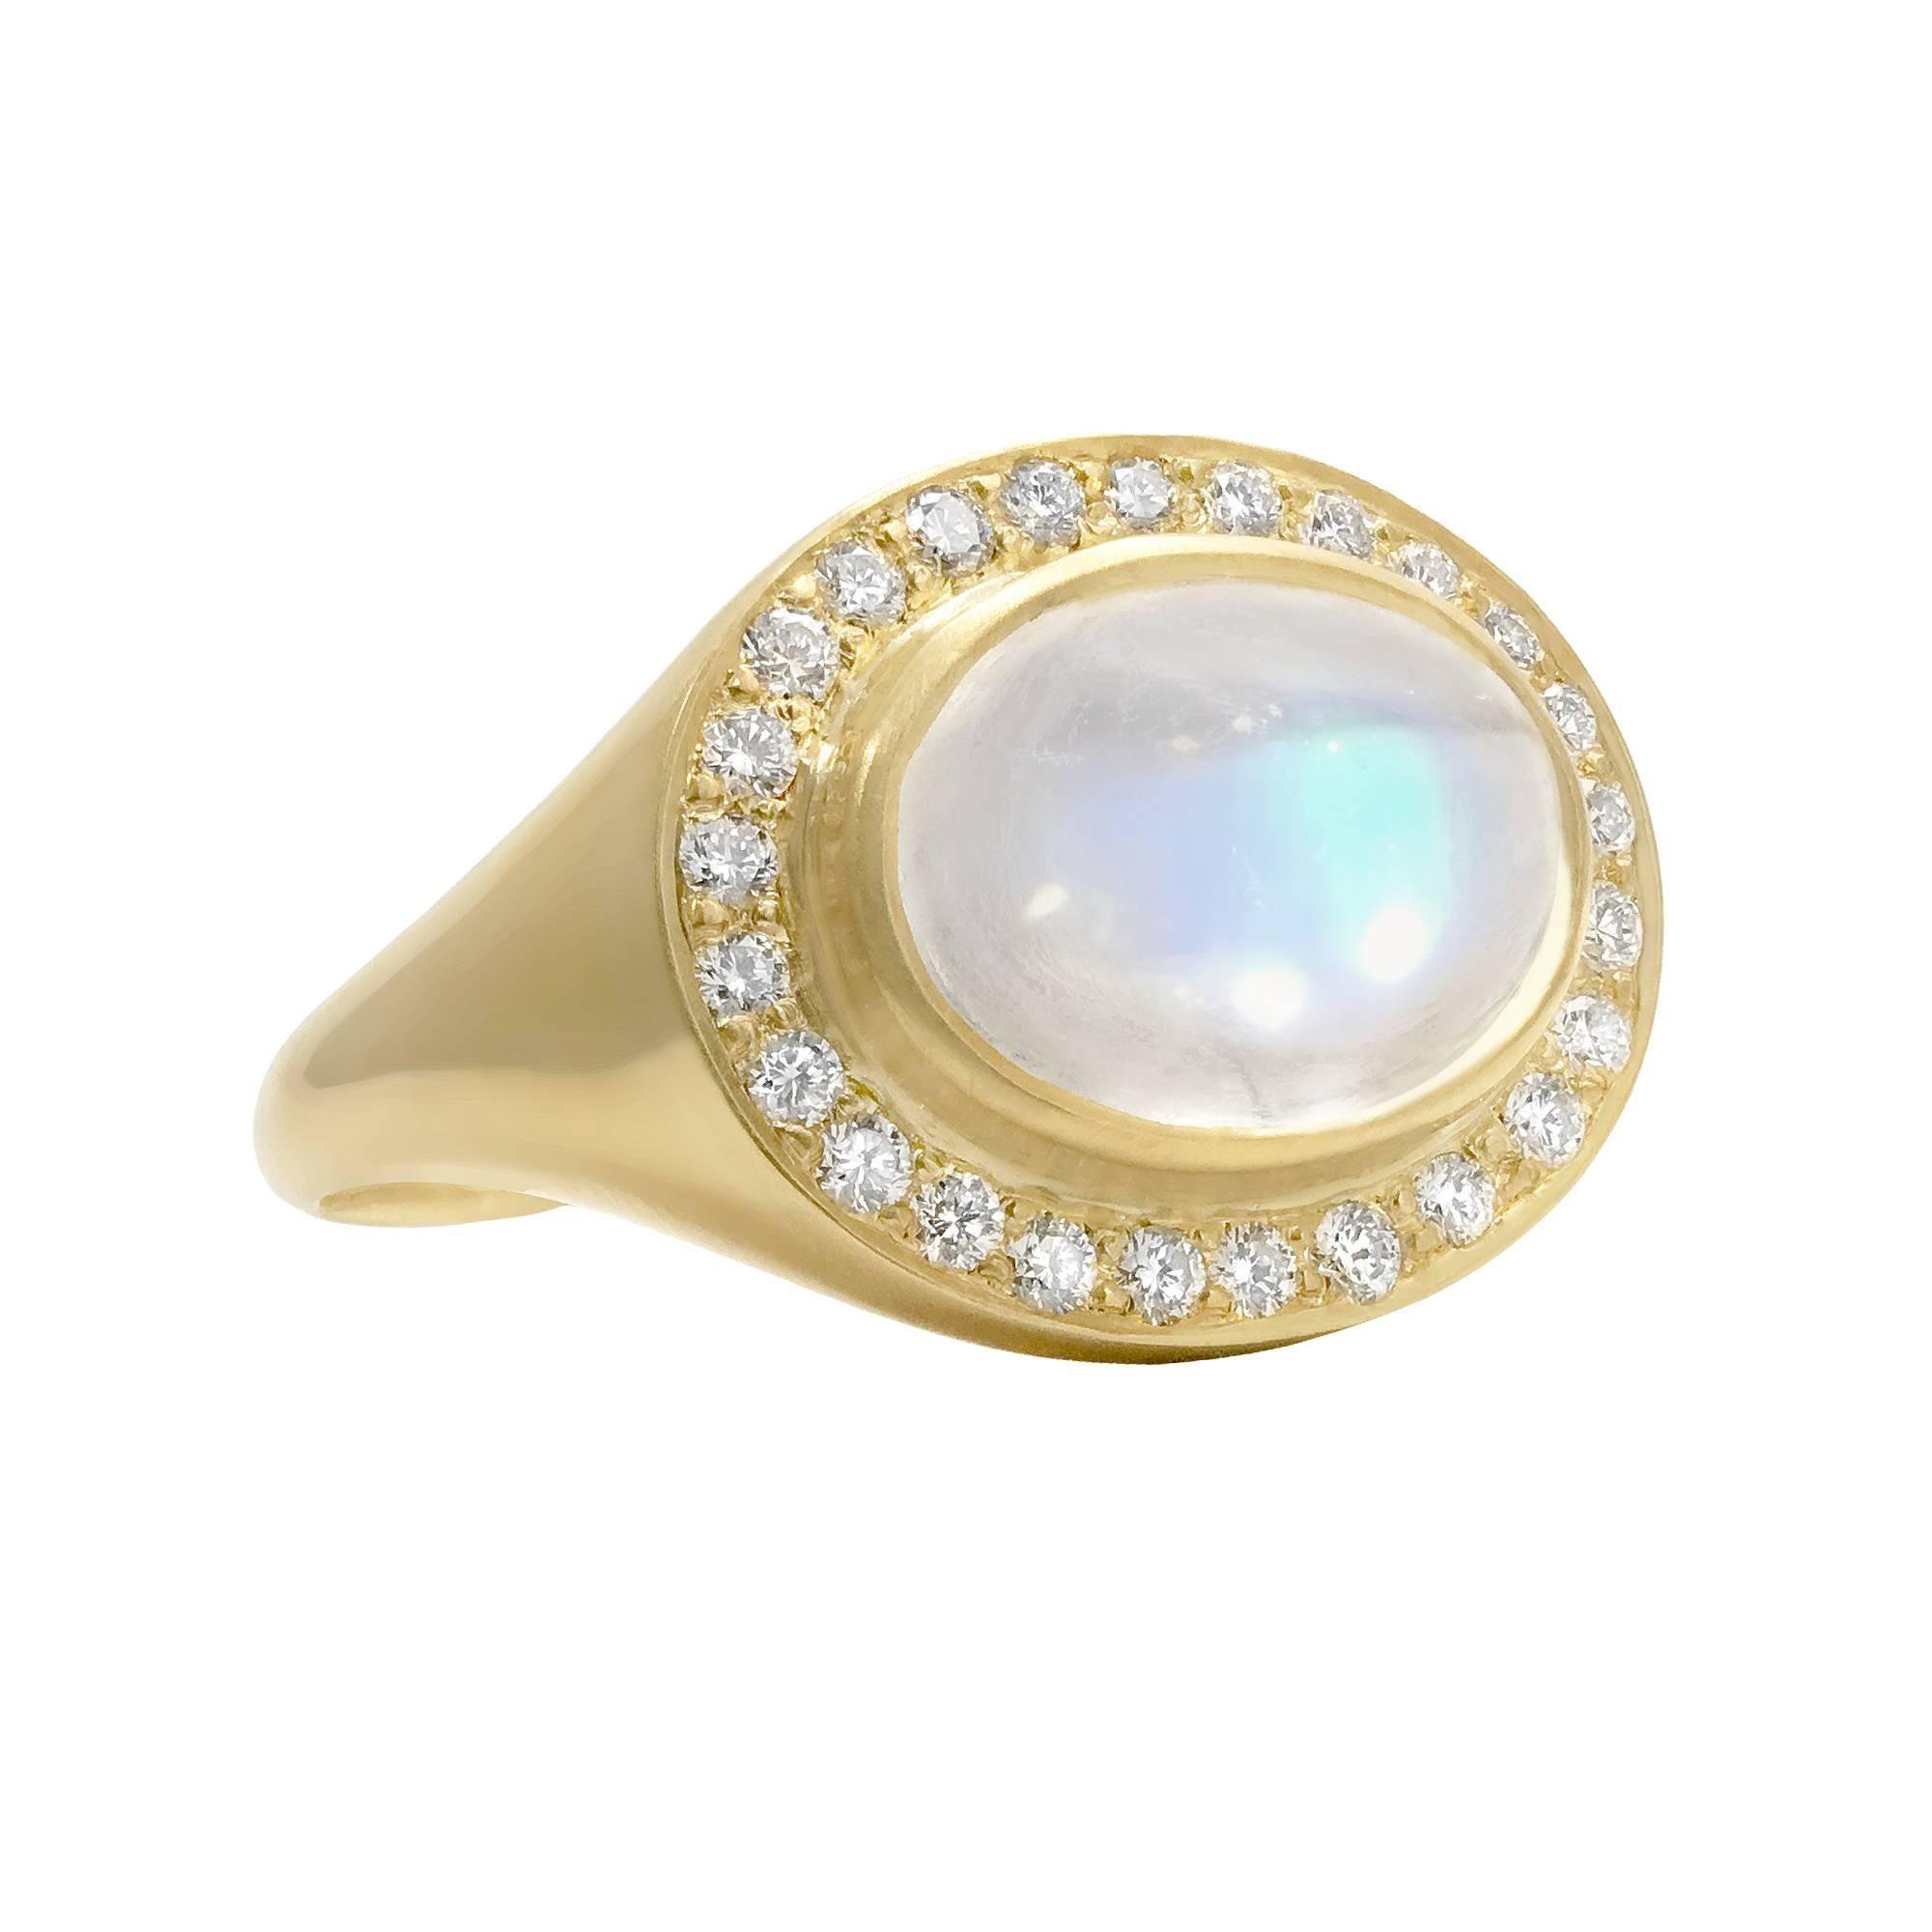 kothari one of a kind oval rainbow moonstone white diamond crown ring